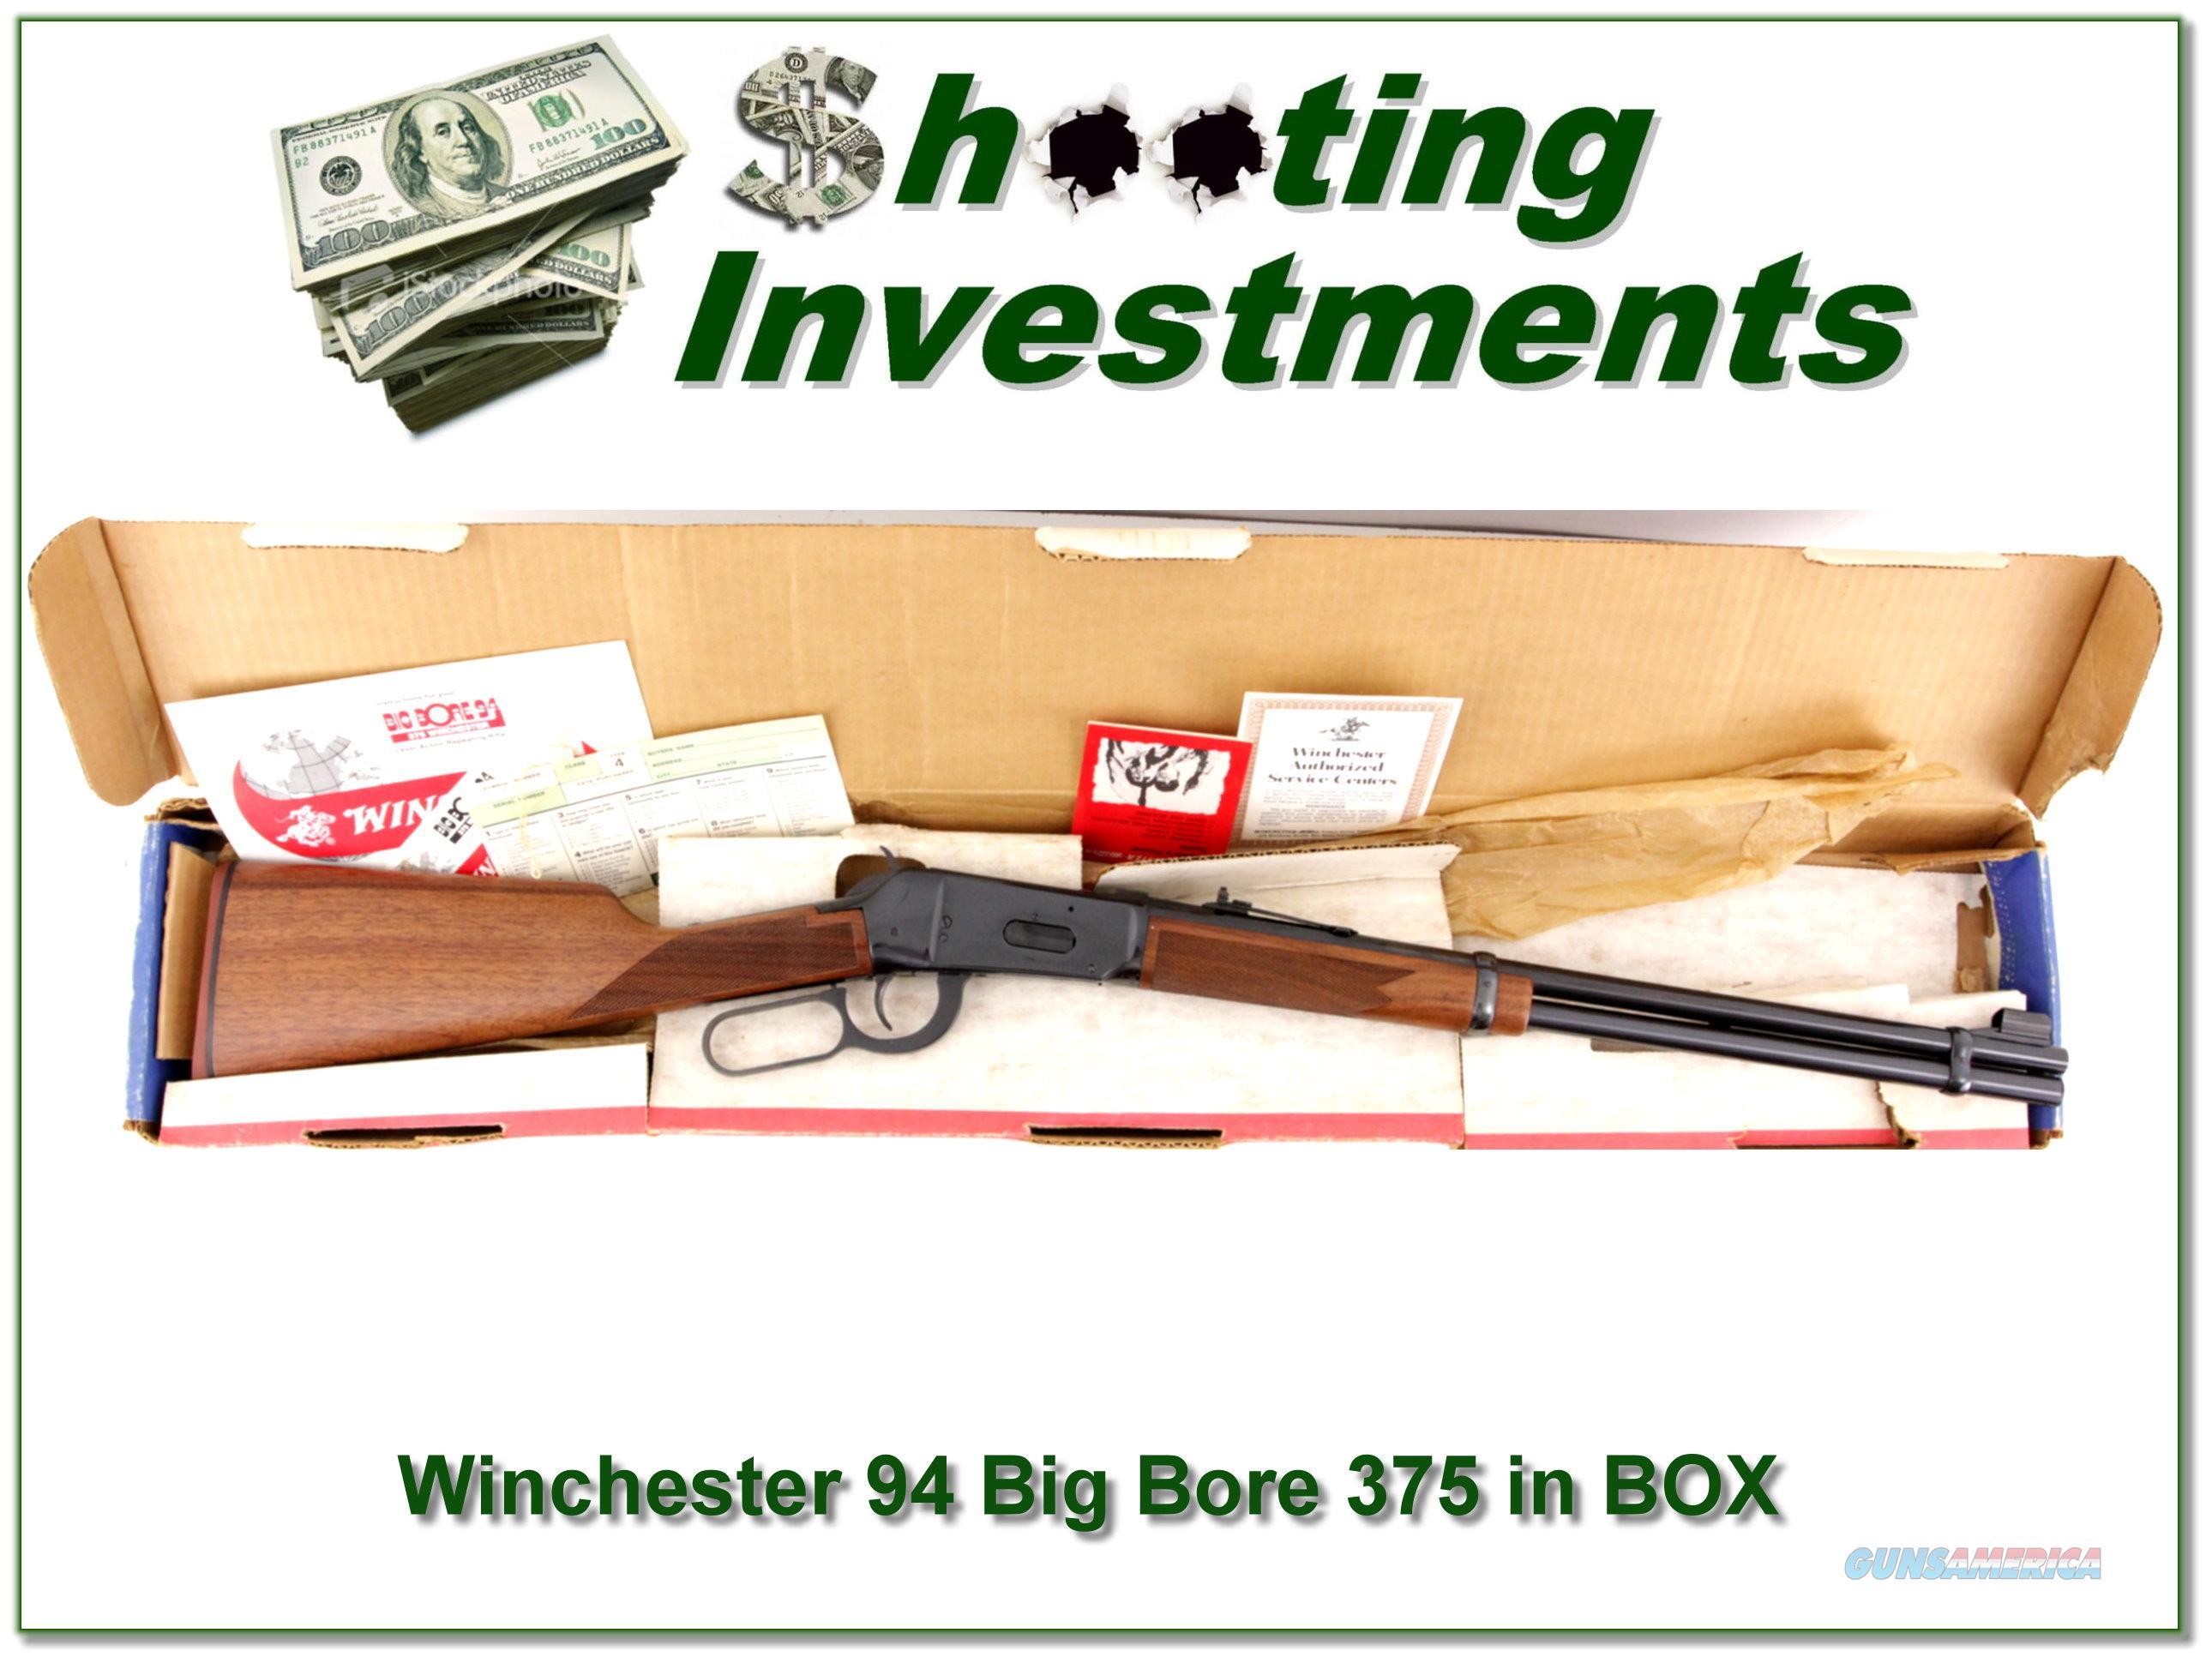 Winchester 94 XTR Big Bore early 375 Win NIB!!!  Guns > Rifles > Winchester Rifles - Modern Lever > Model 94 > Post-64